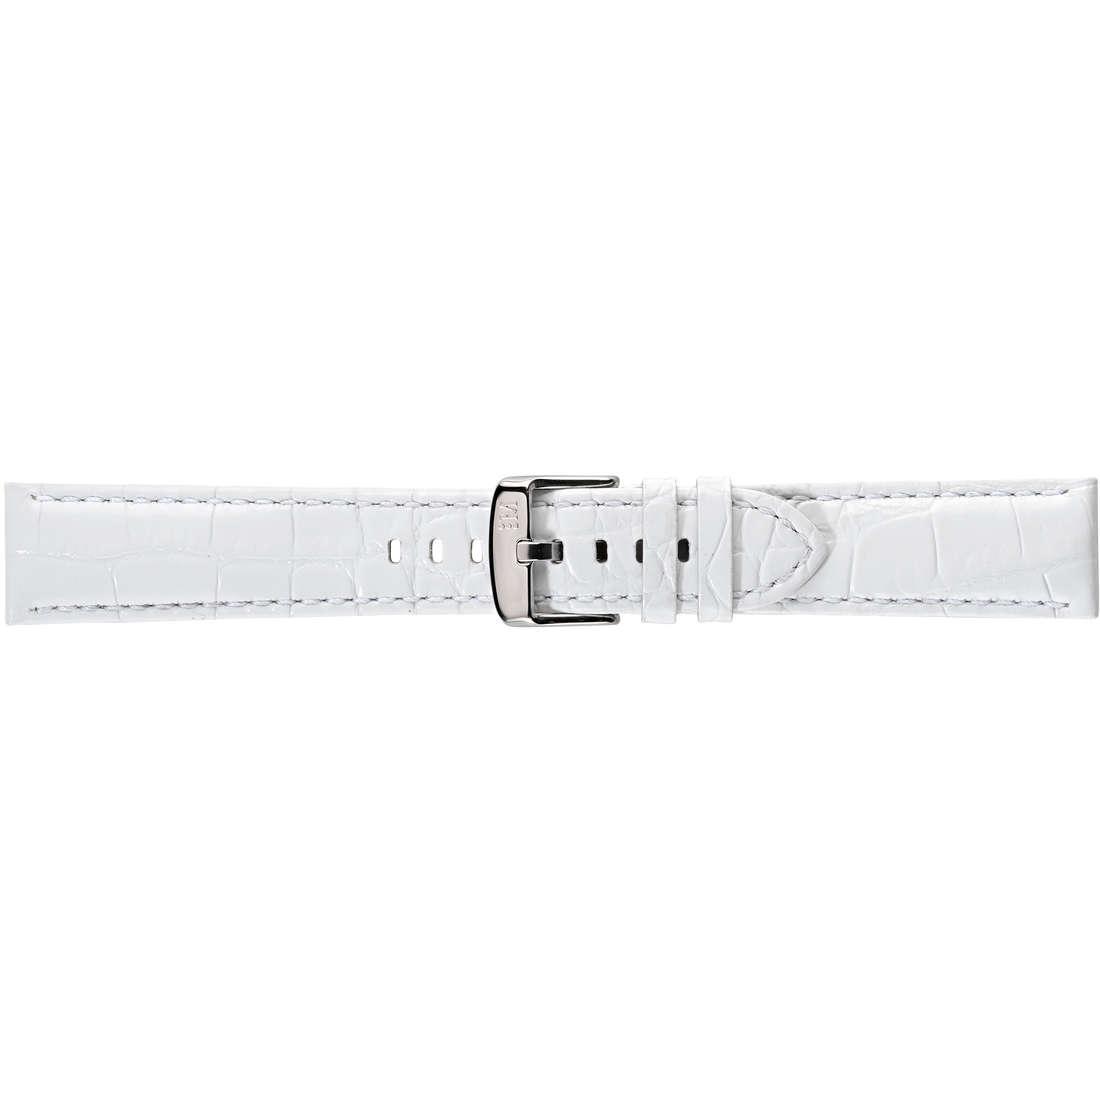 watch watch bands watch straps man Morellato Performance A01X3555990017CR20